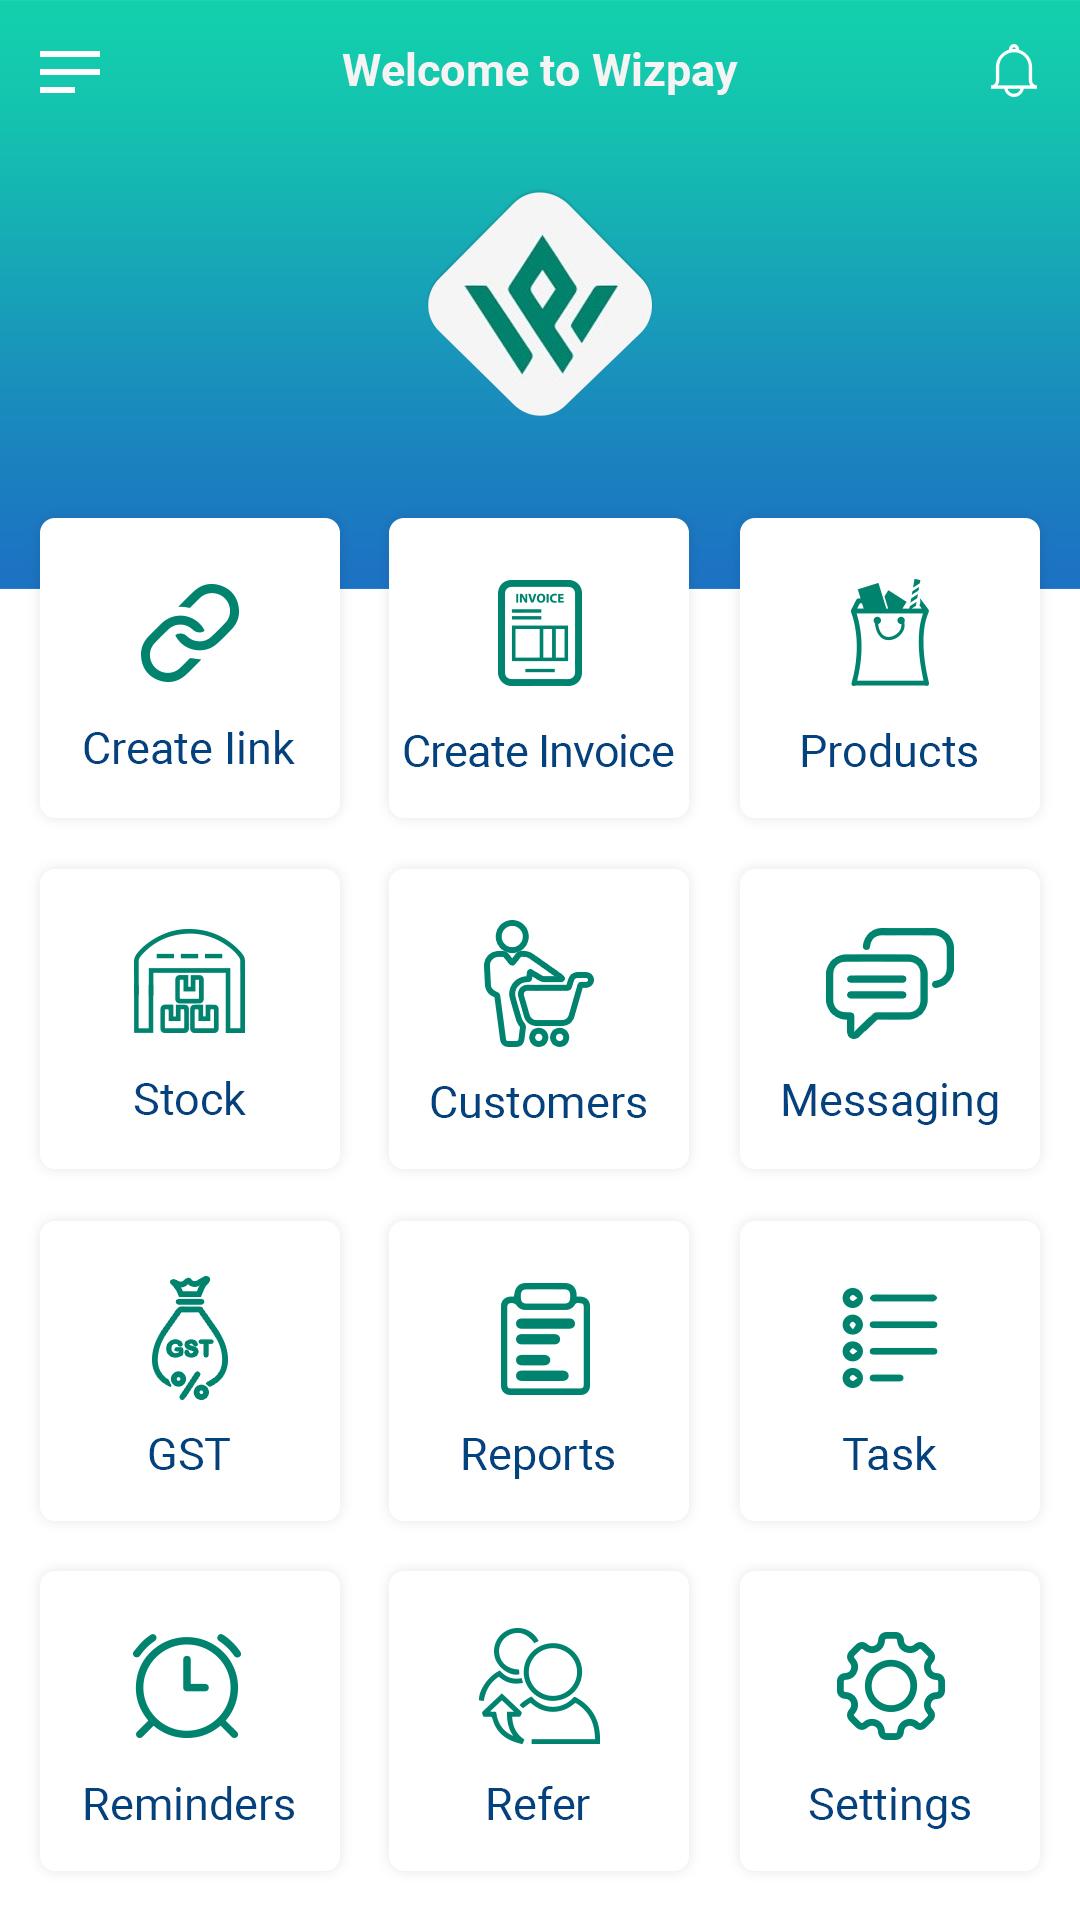 Wizpay Mobile banking, ewallet, POS, inventory management app Screenshot 3